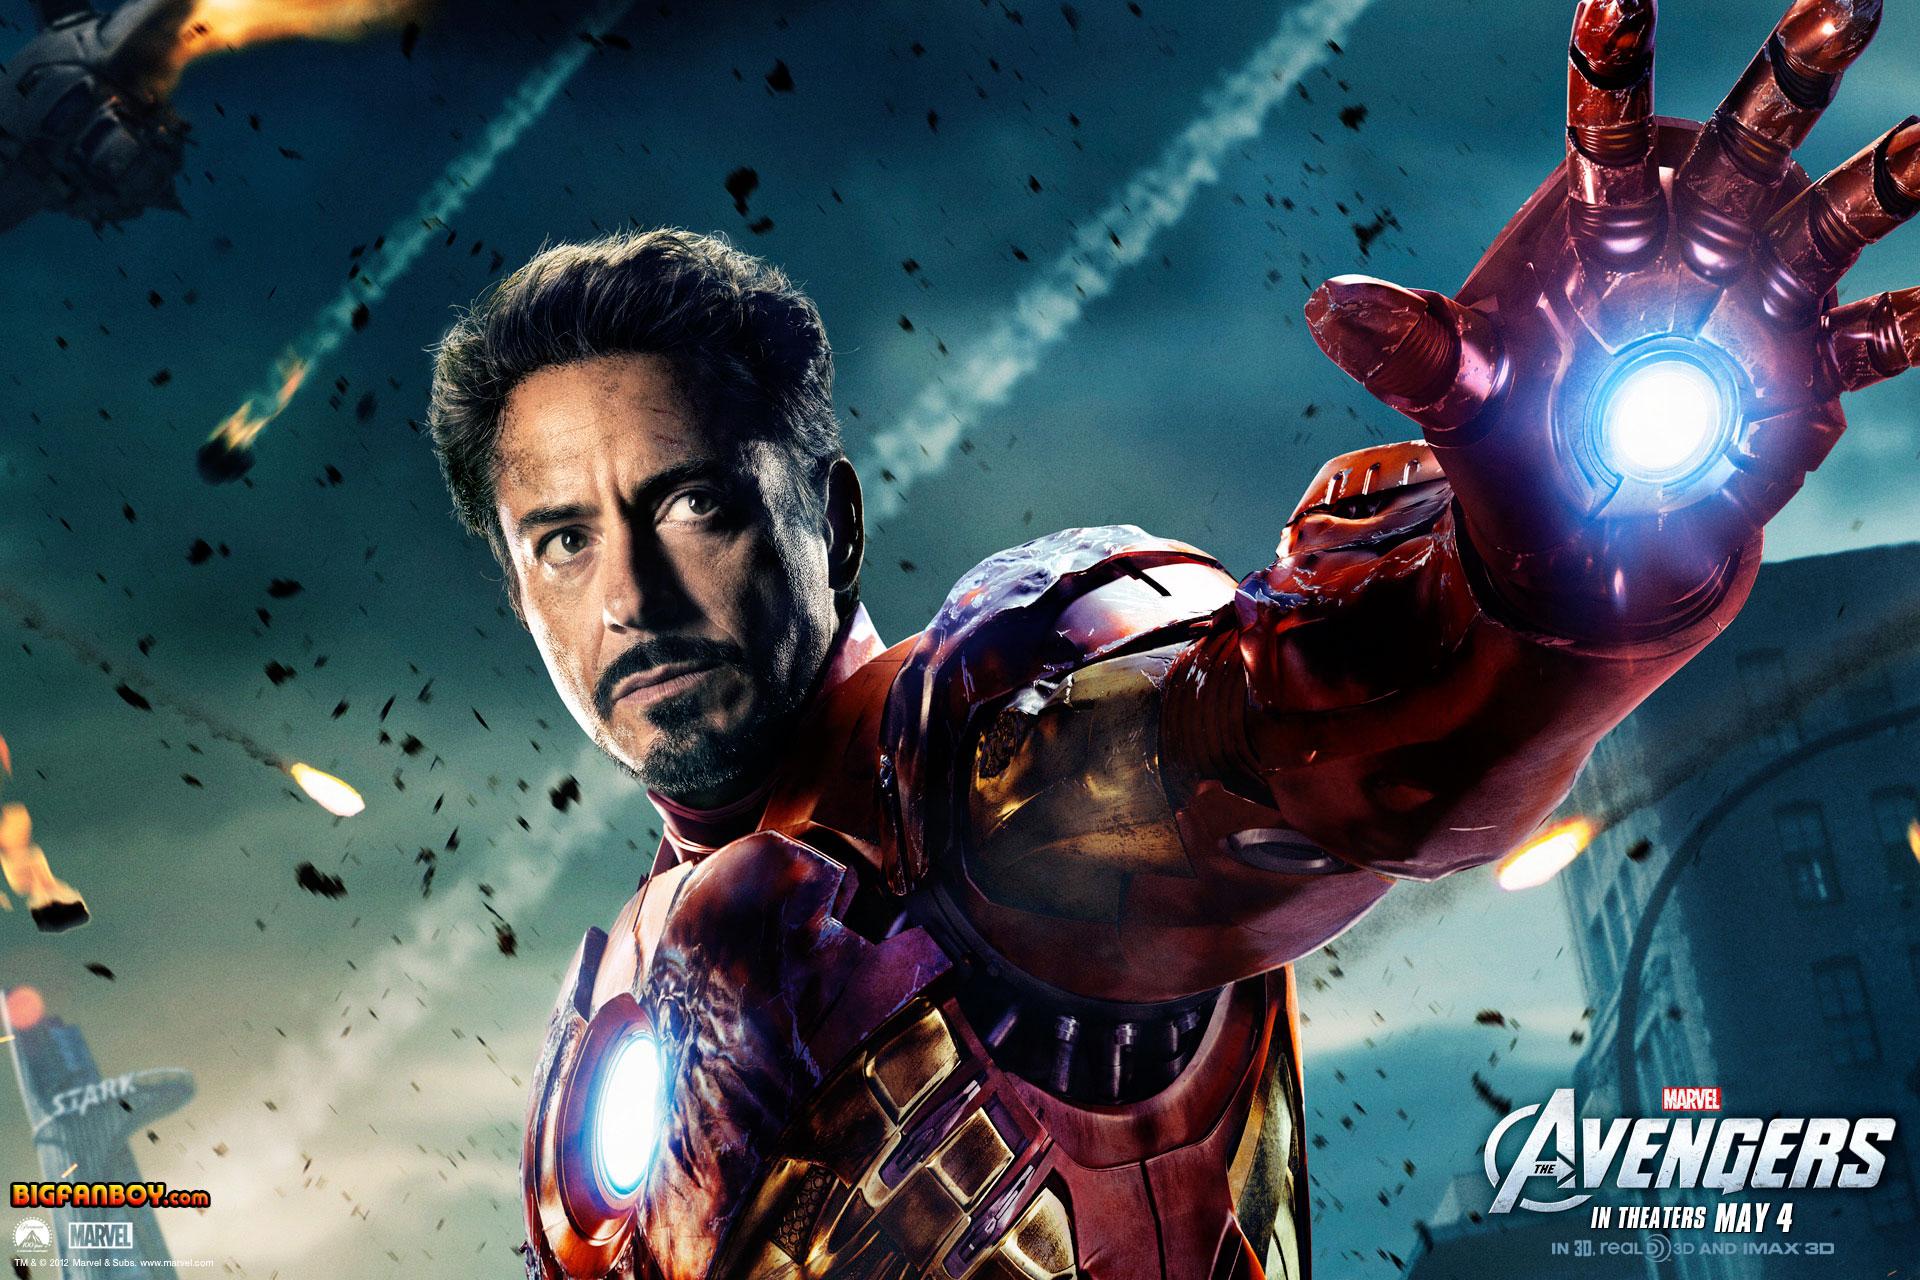 Download marvel s the avengers wallpapers for your desktop bigfanboy